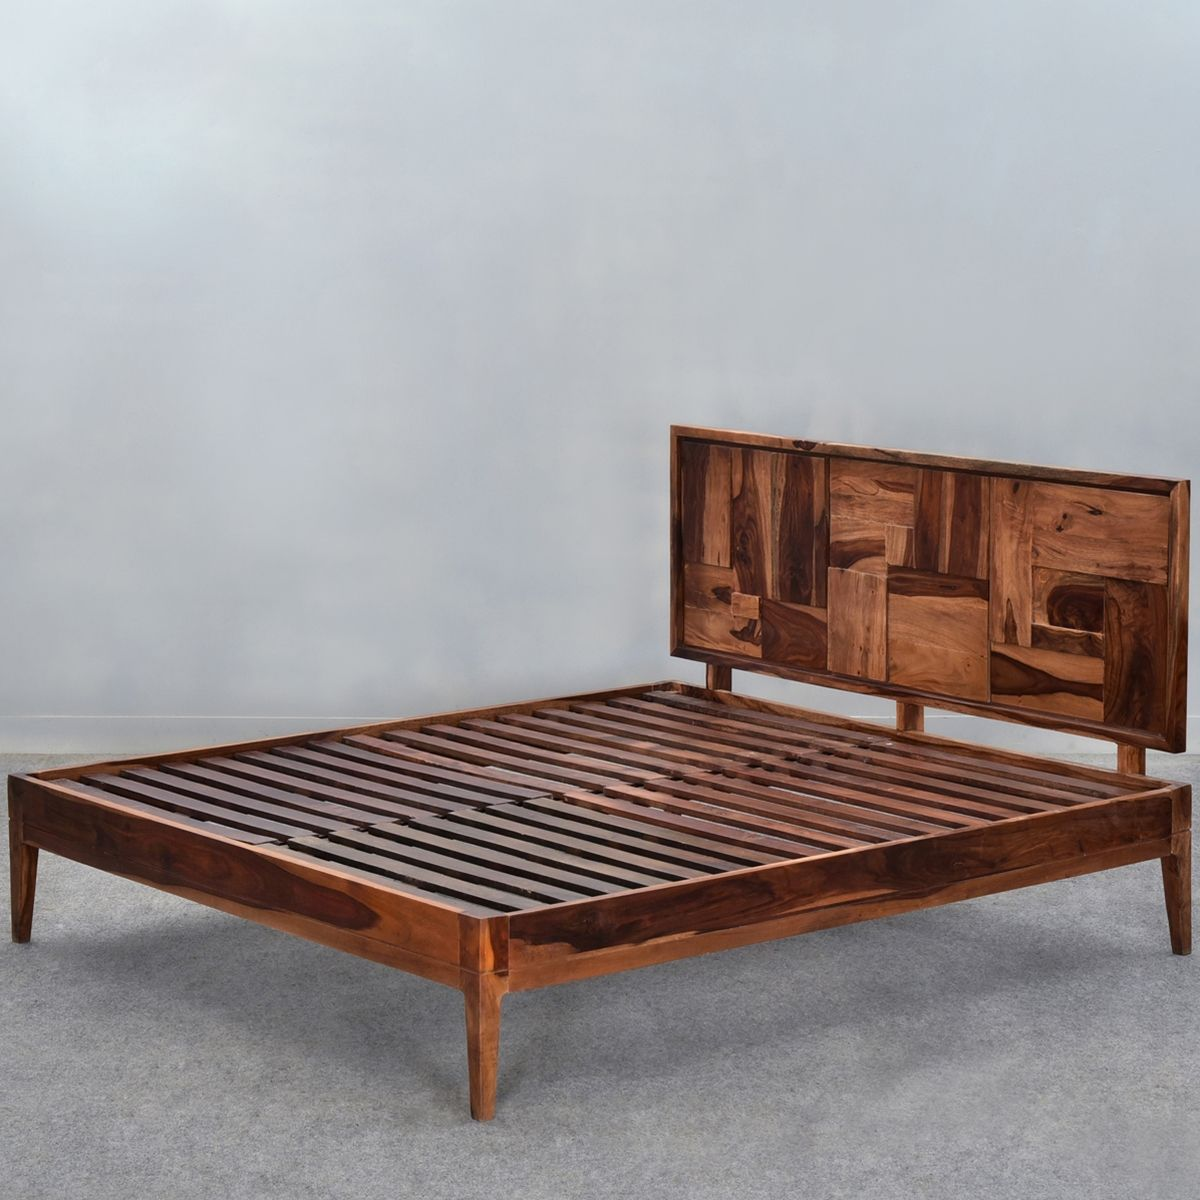 Sunrise Modern Pioneer Solid Wood Platform Bed Frame w Headboard